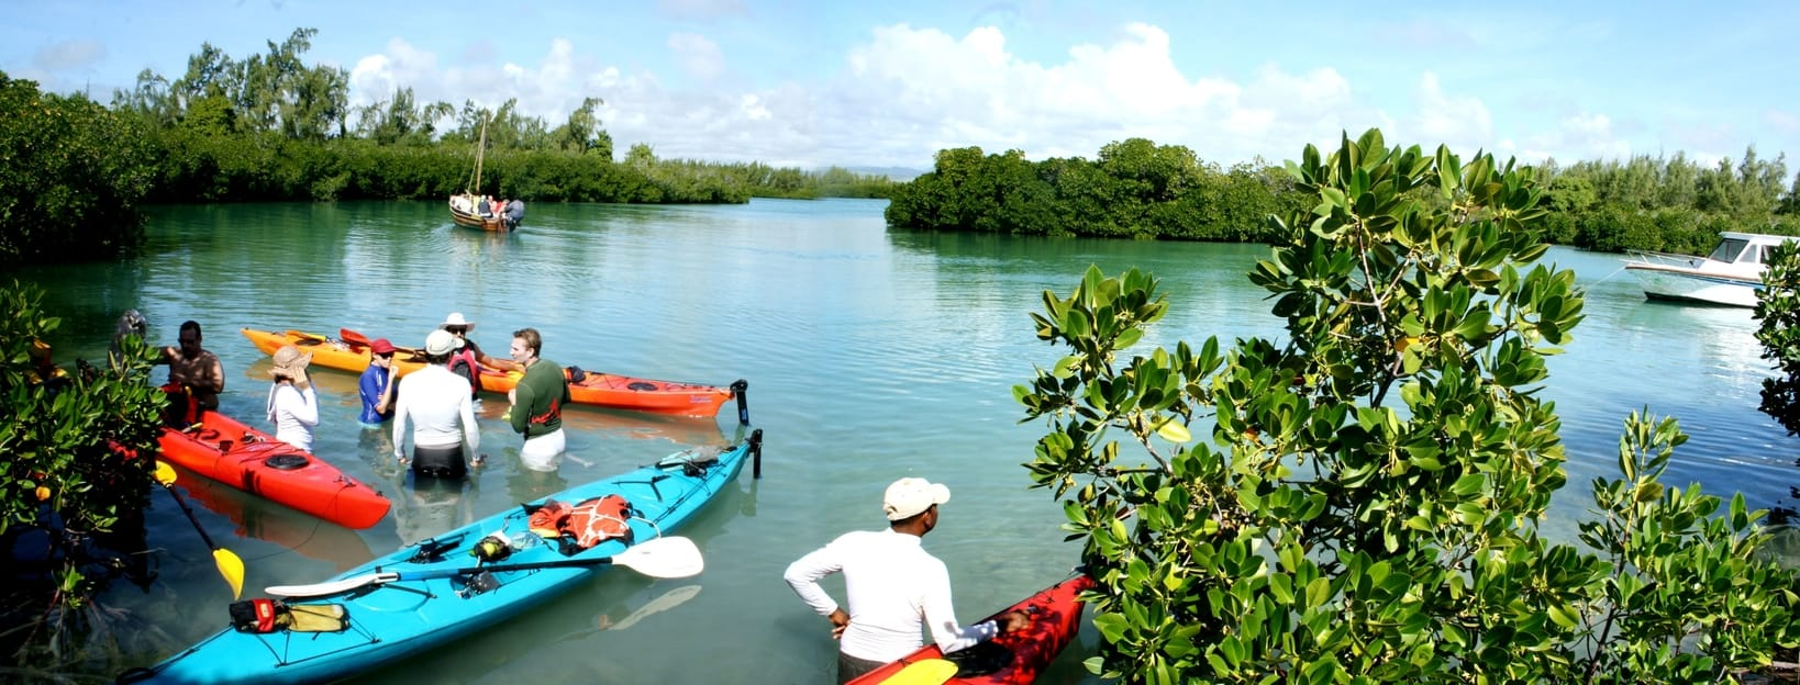 Explore the surrounding islands Credit: Yemaya Adventures